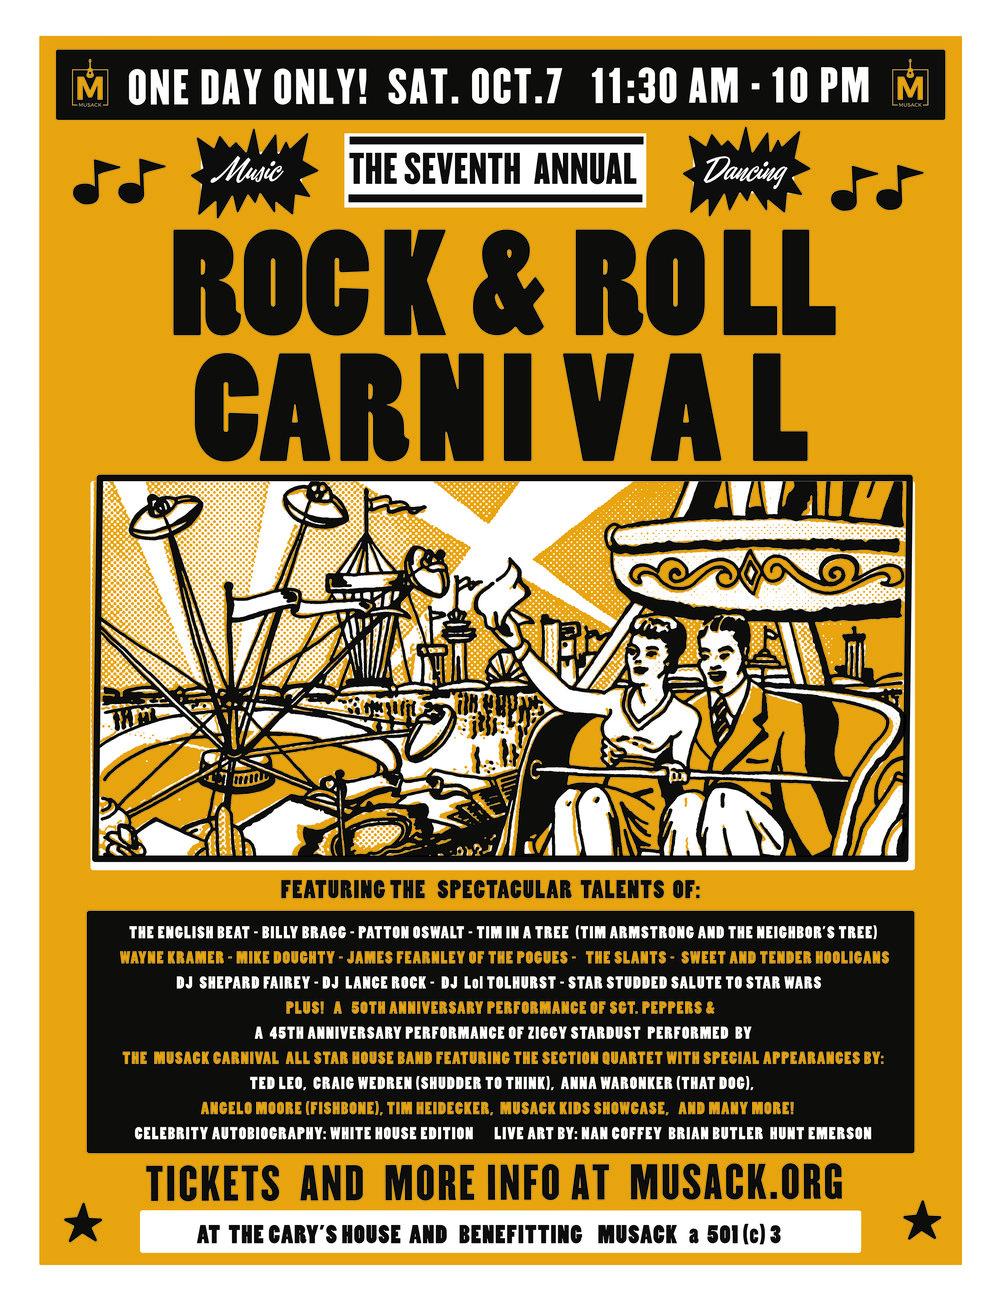 MUSACK_ROCKROLL_CARNIVAL_2017_FINAL.jpg